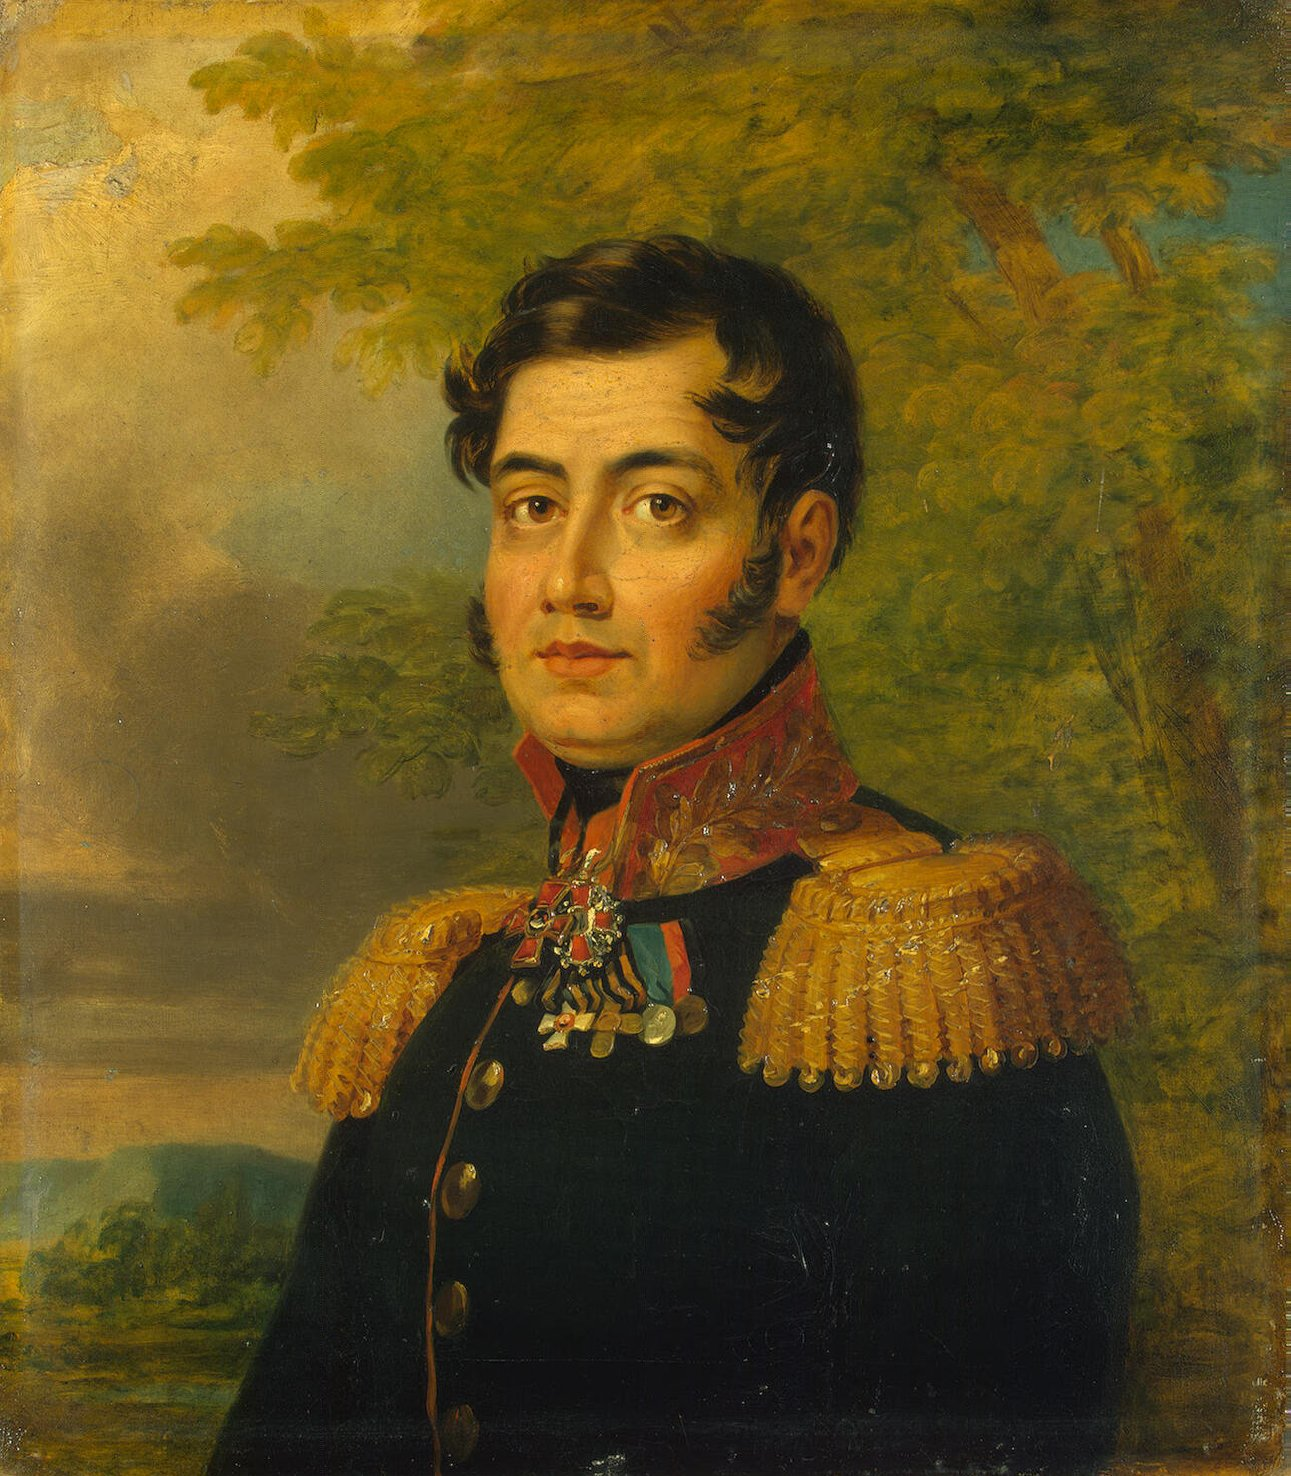 Наумов, Михаил Фёдорович